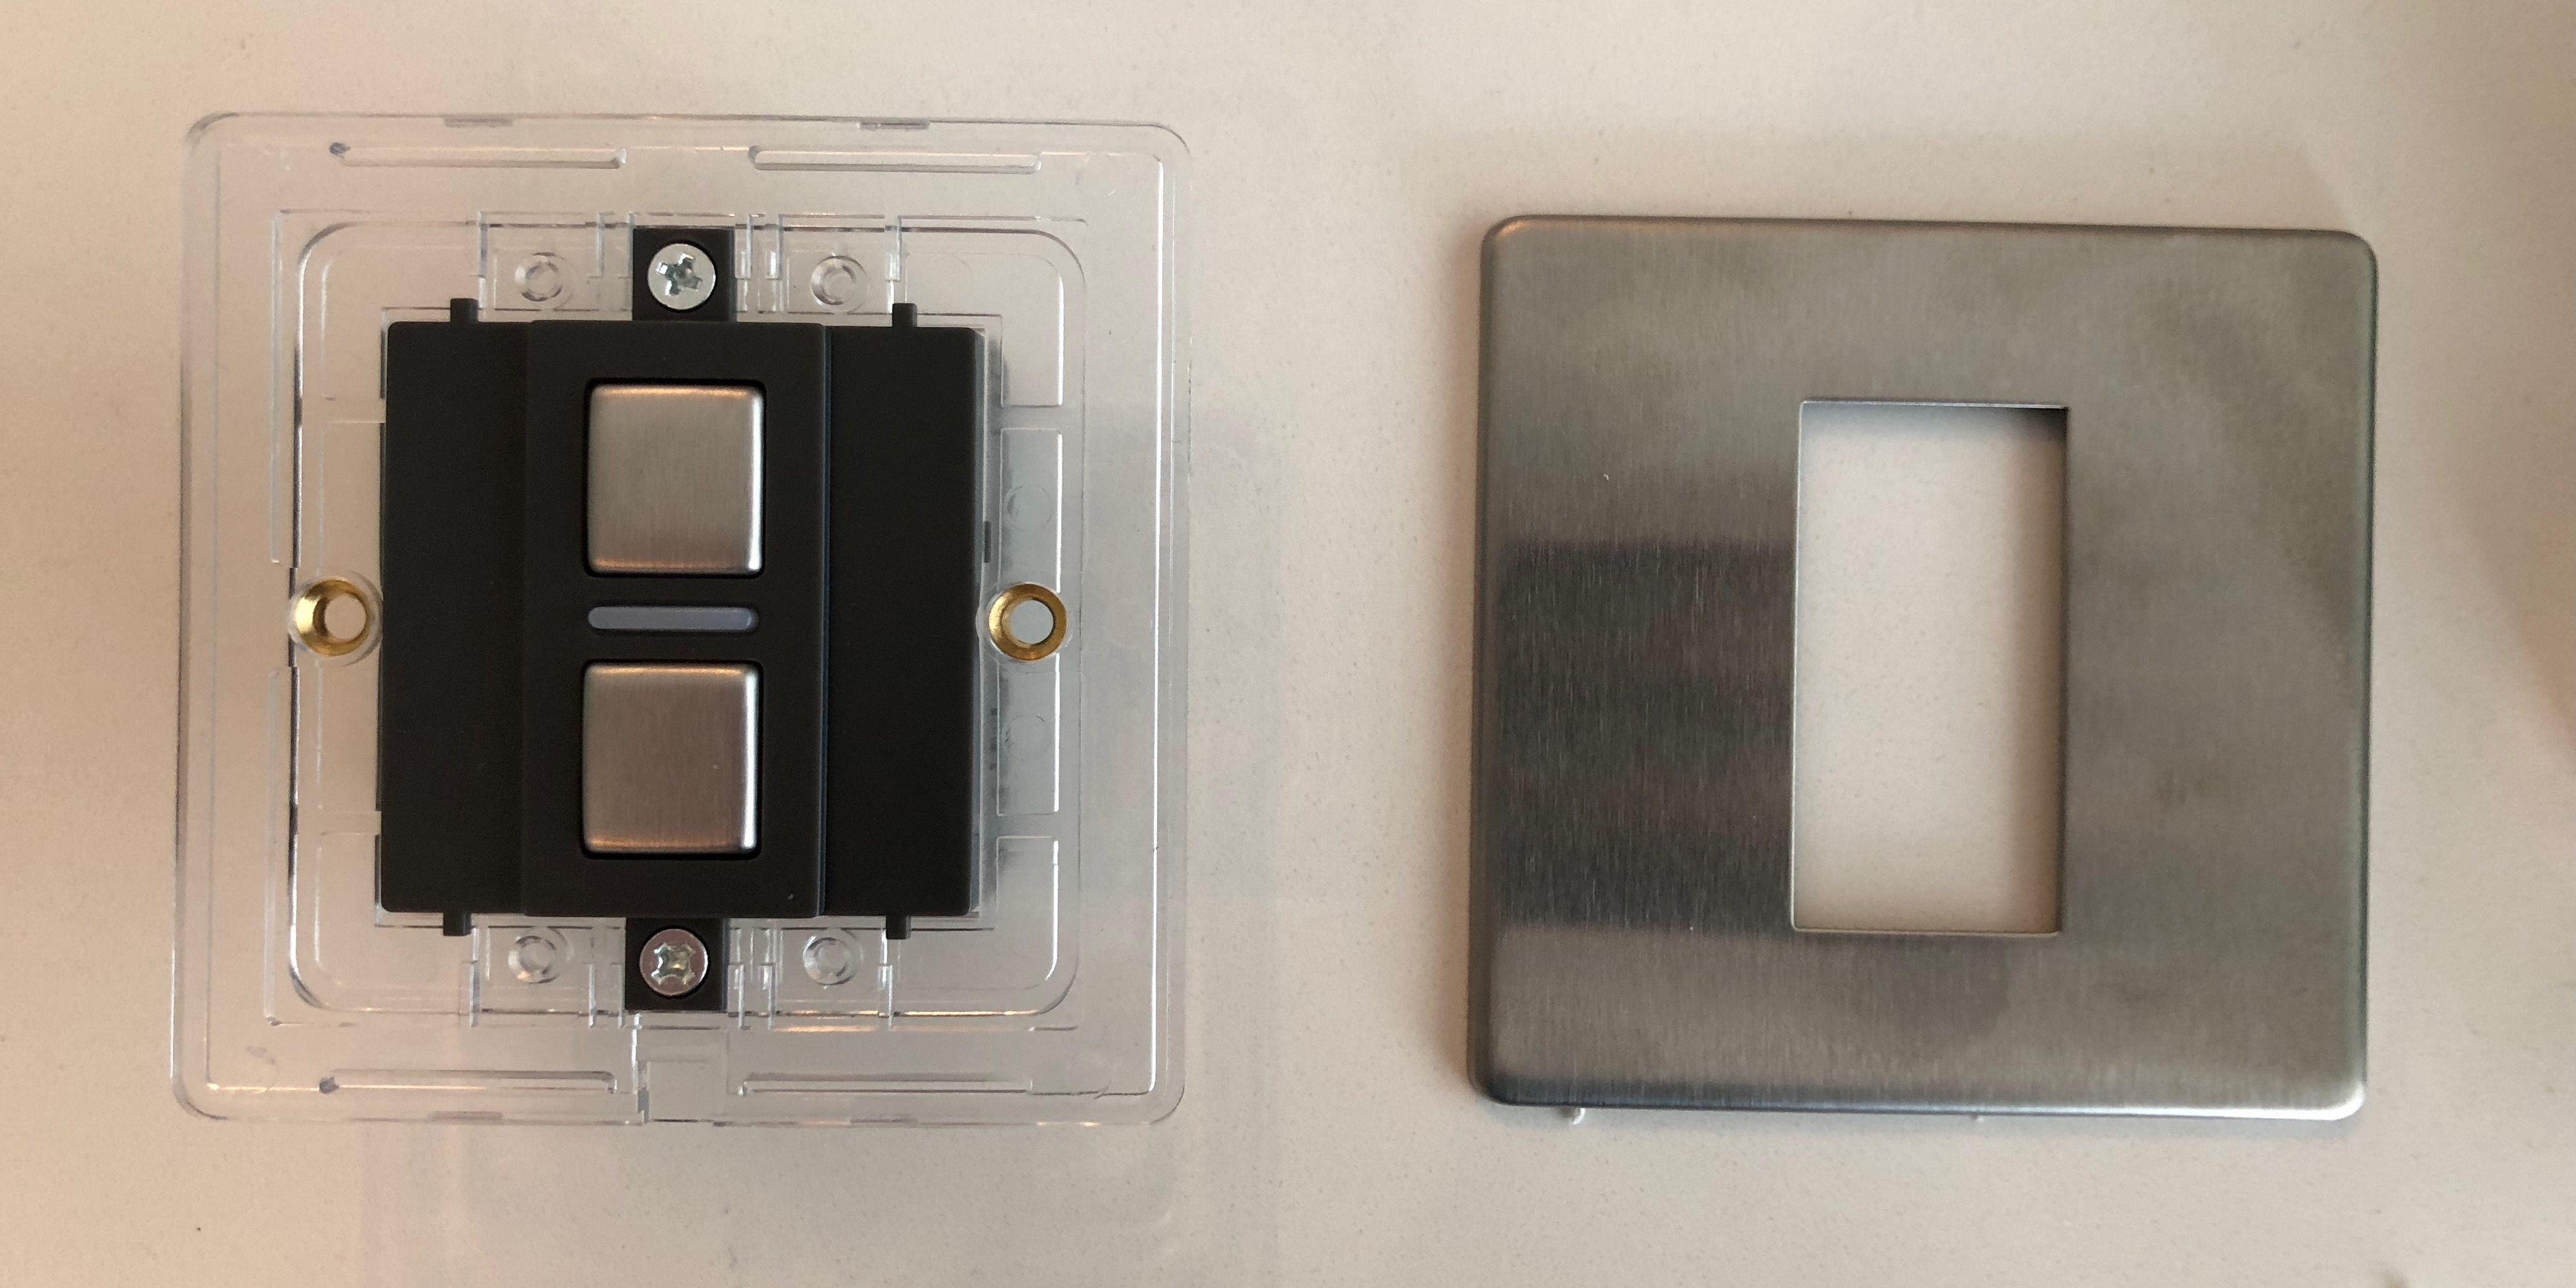 One Way Lighting Circuit Using Inline Switching